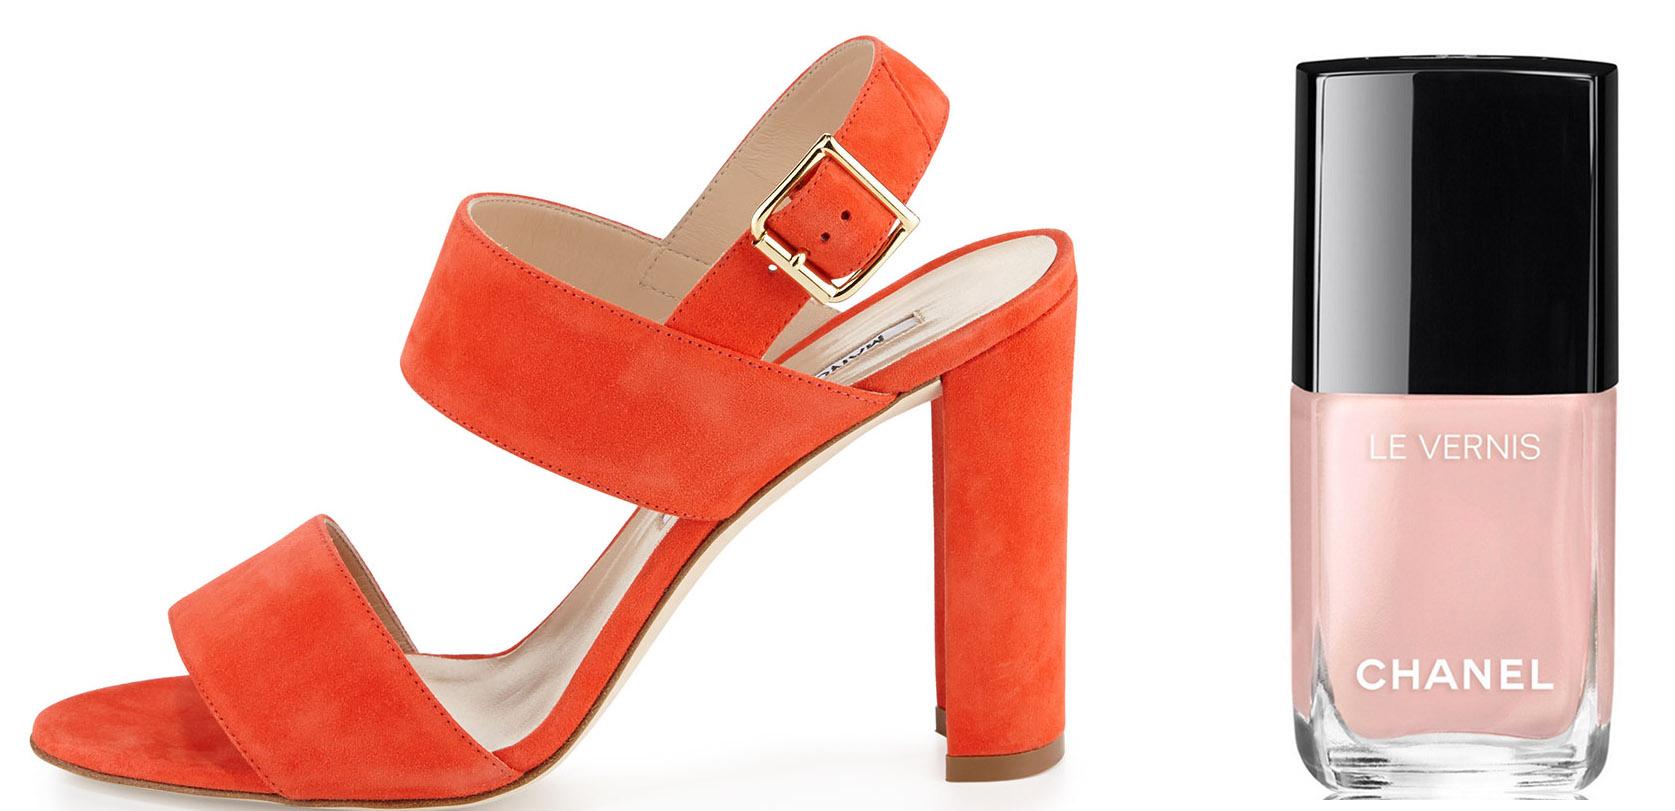 Manolo Blahnik Kahn Suede Double-Band Sandal $765 via Bergdorf Goodman Chanel Le Vernis Ballerina Nail Color $28 via Chanel